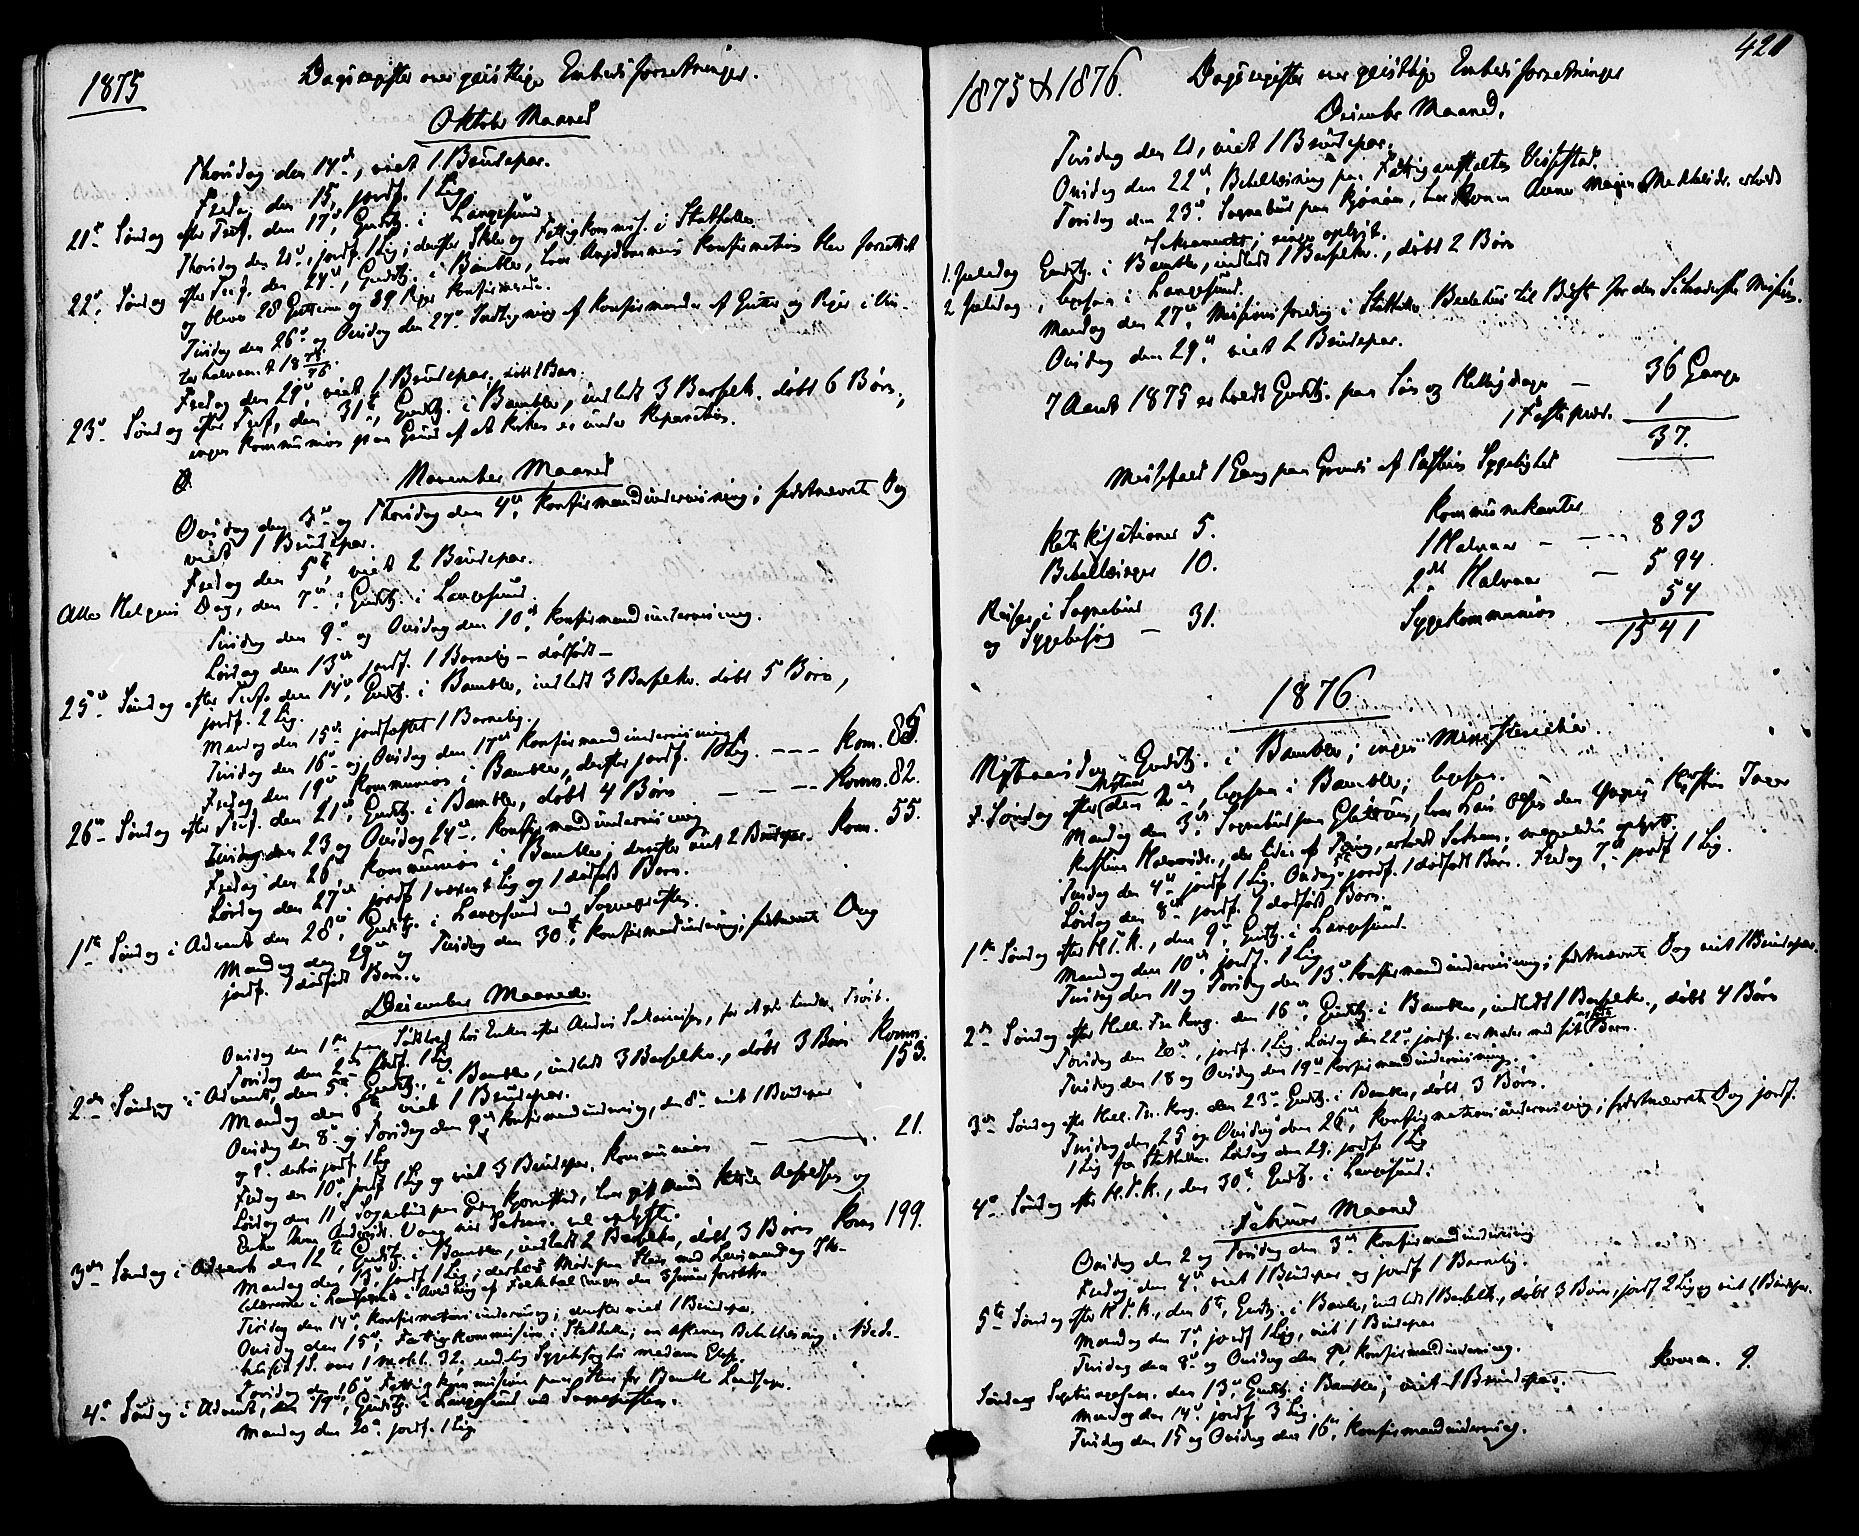 SAKO, Bamble kirkebøker, F/Fa/L0006: Ministerialbok nr. I 6, 1869-1877, s. 420